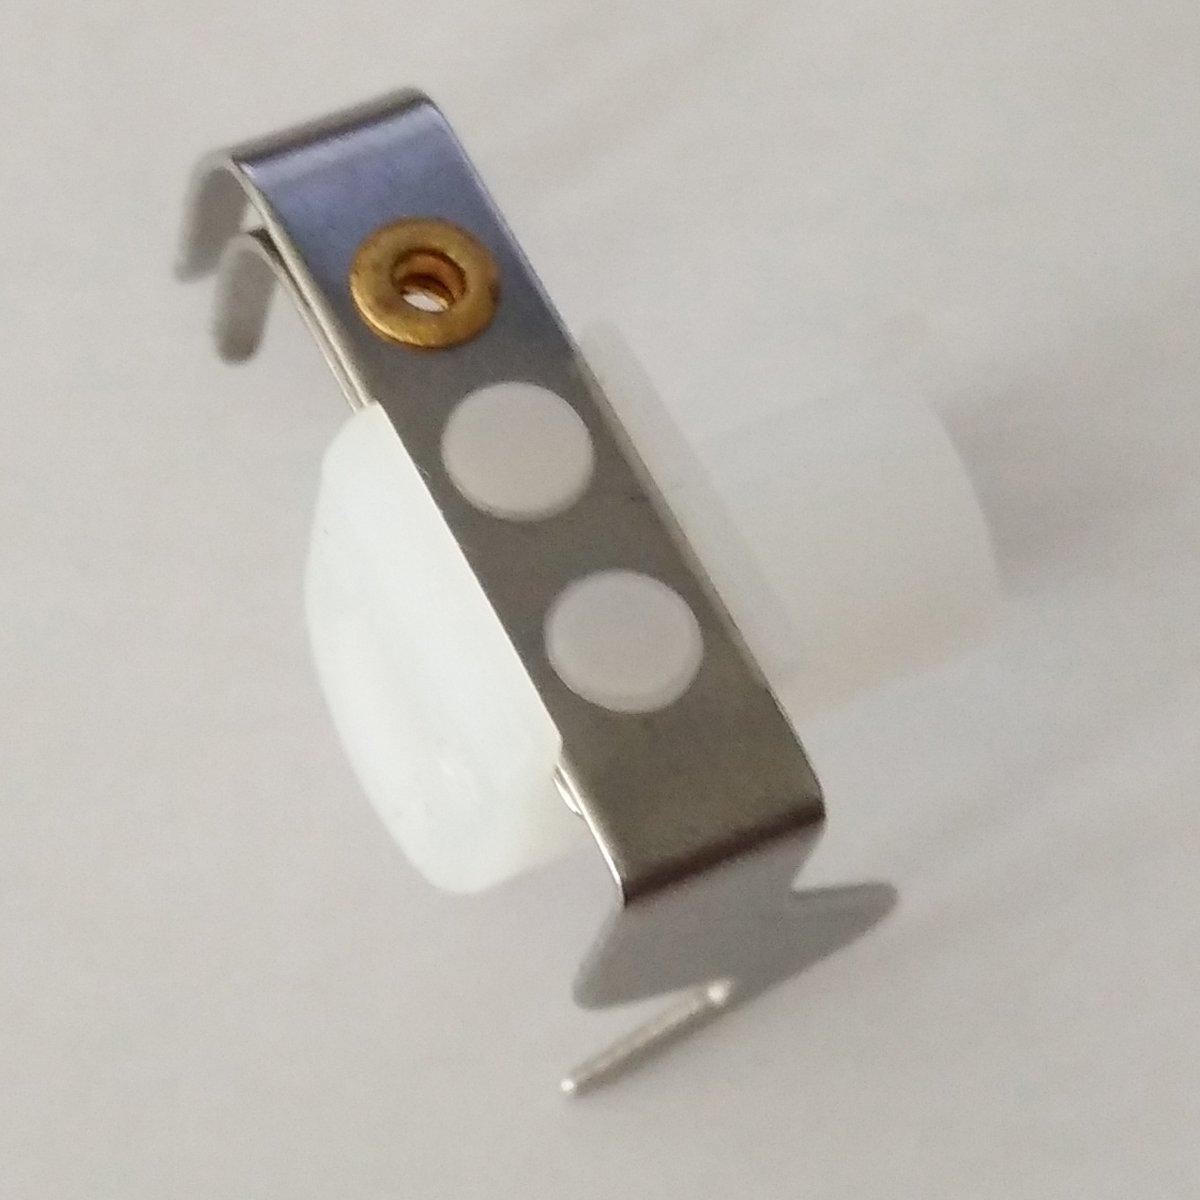 CE4000 CE5000# XA1854001 B375 LNKA Needle Threader #XA1854051 for Brother B373 B376 B37,CE1100PRW CE4400